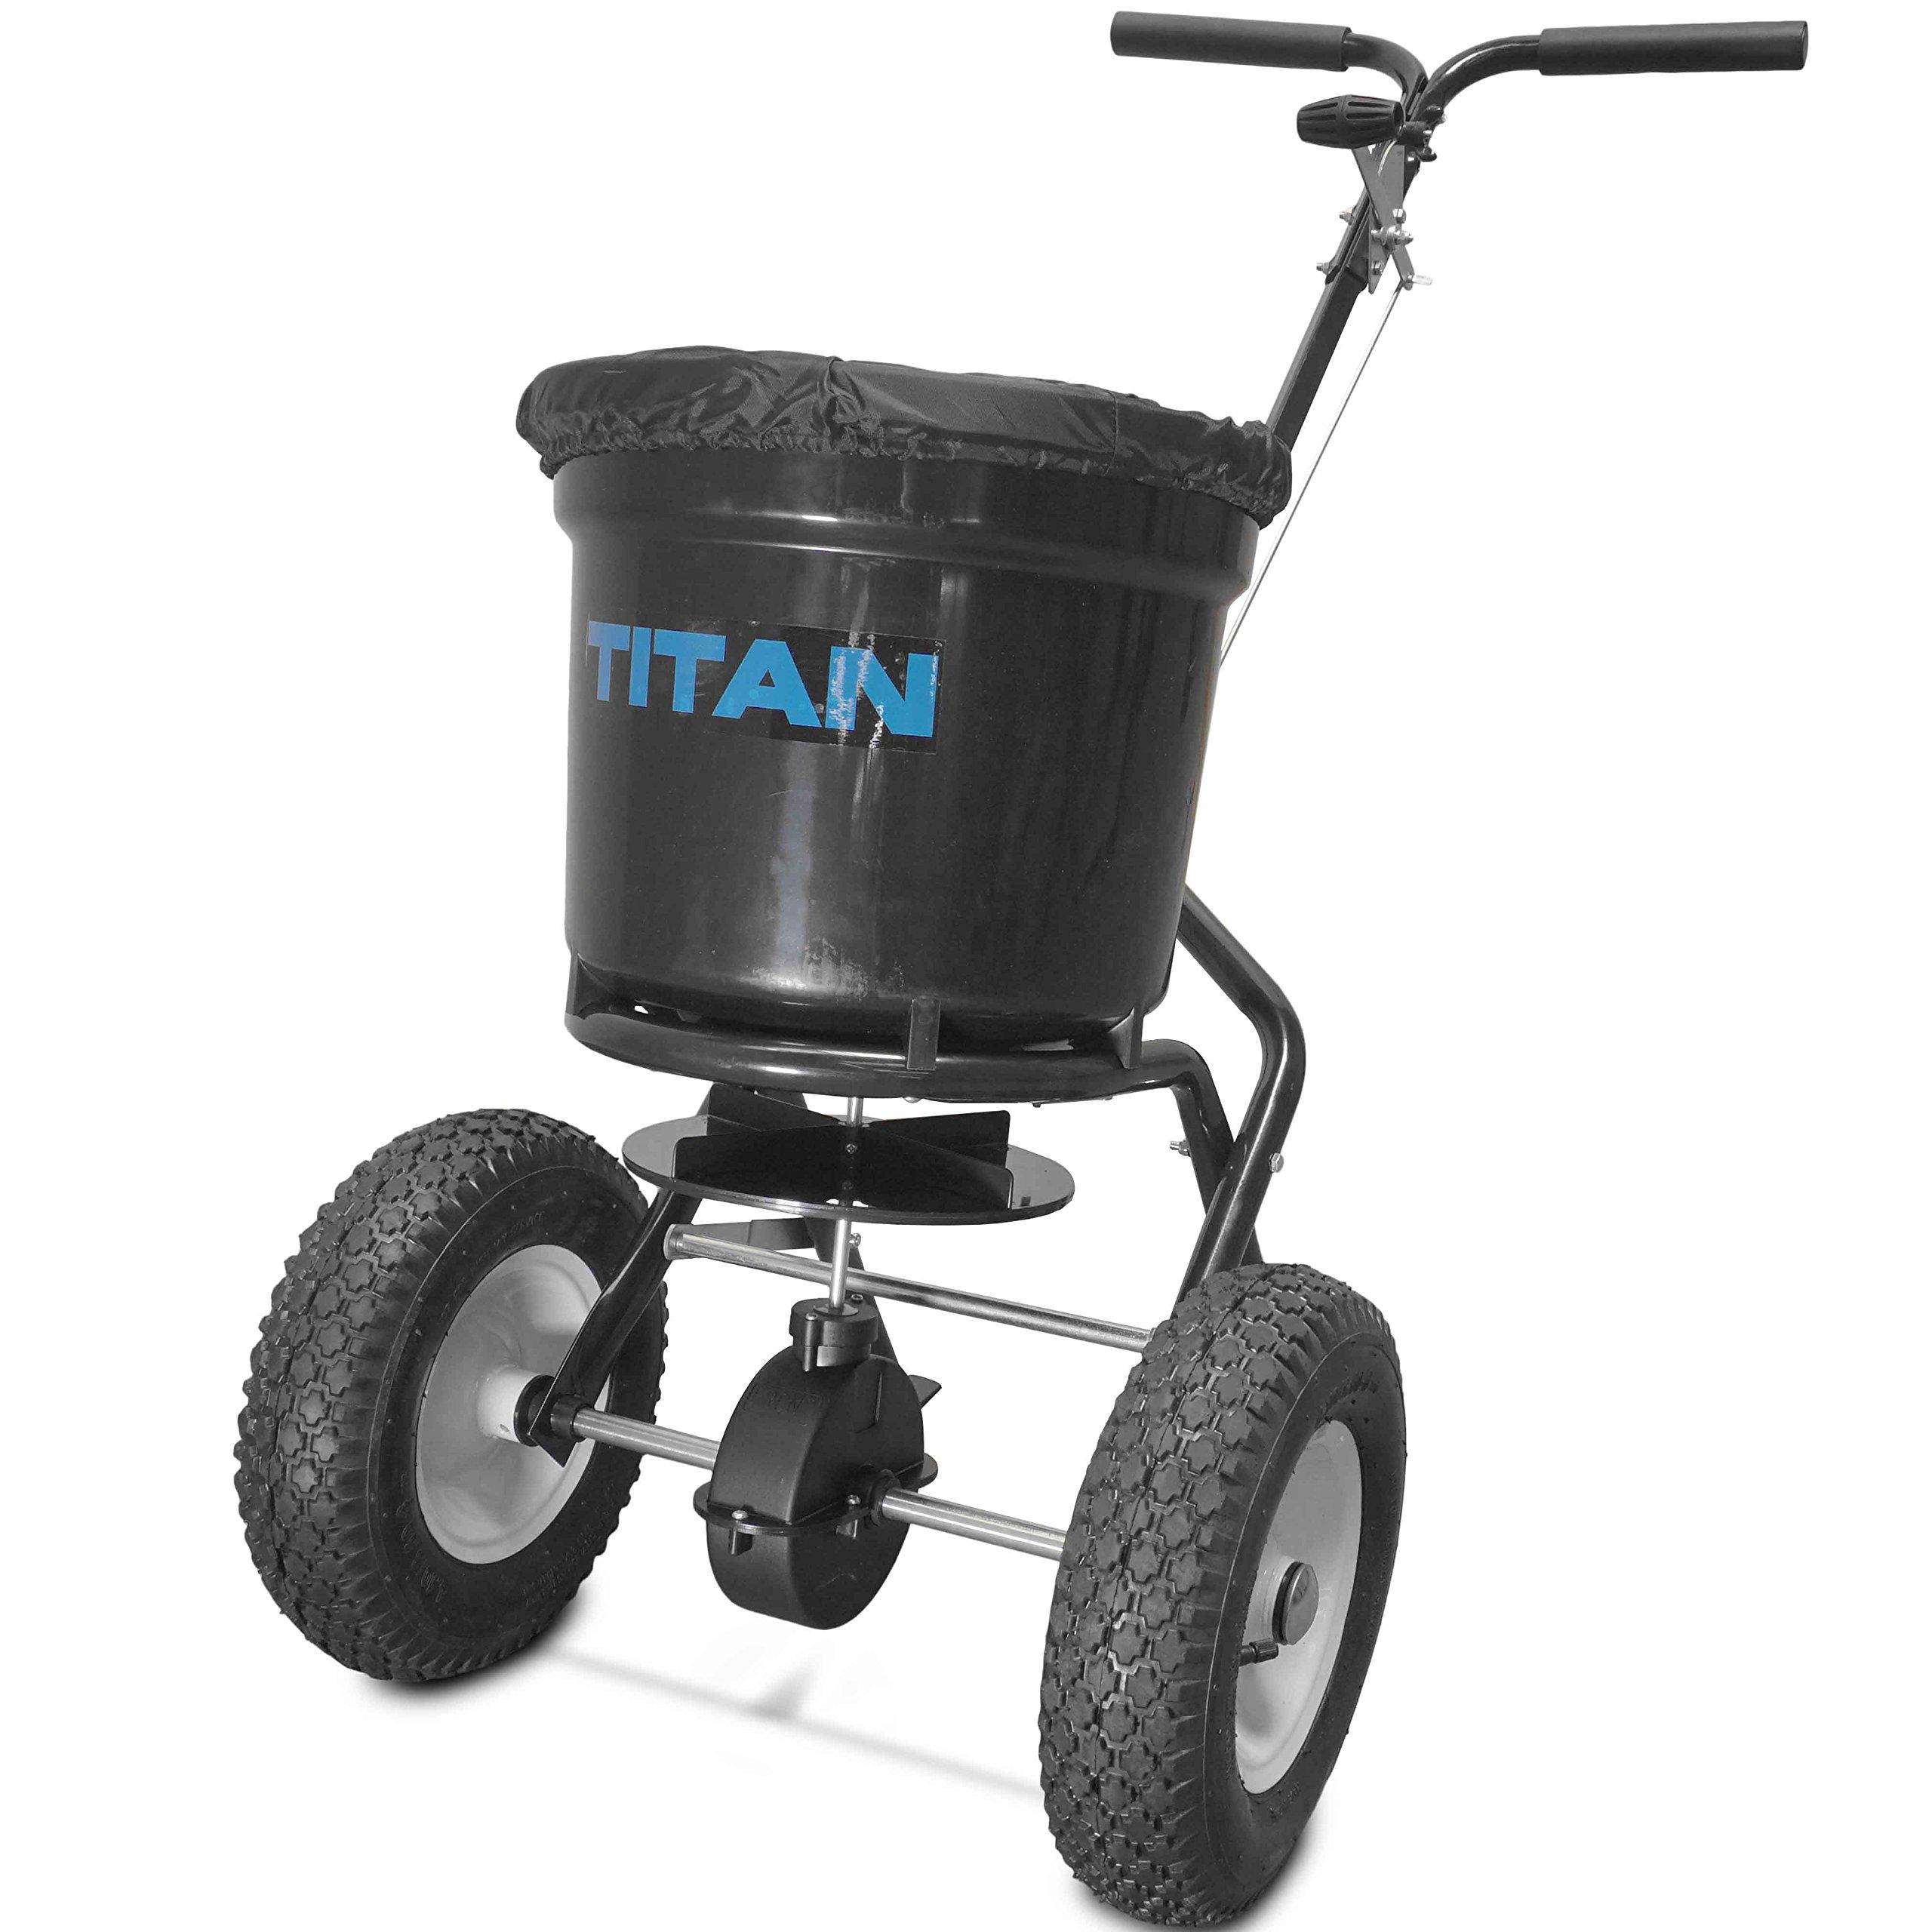 Titan 50 lb Professional Broadcast Spreader for Lawn Fertilizer Seed